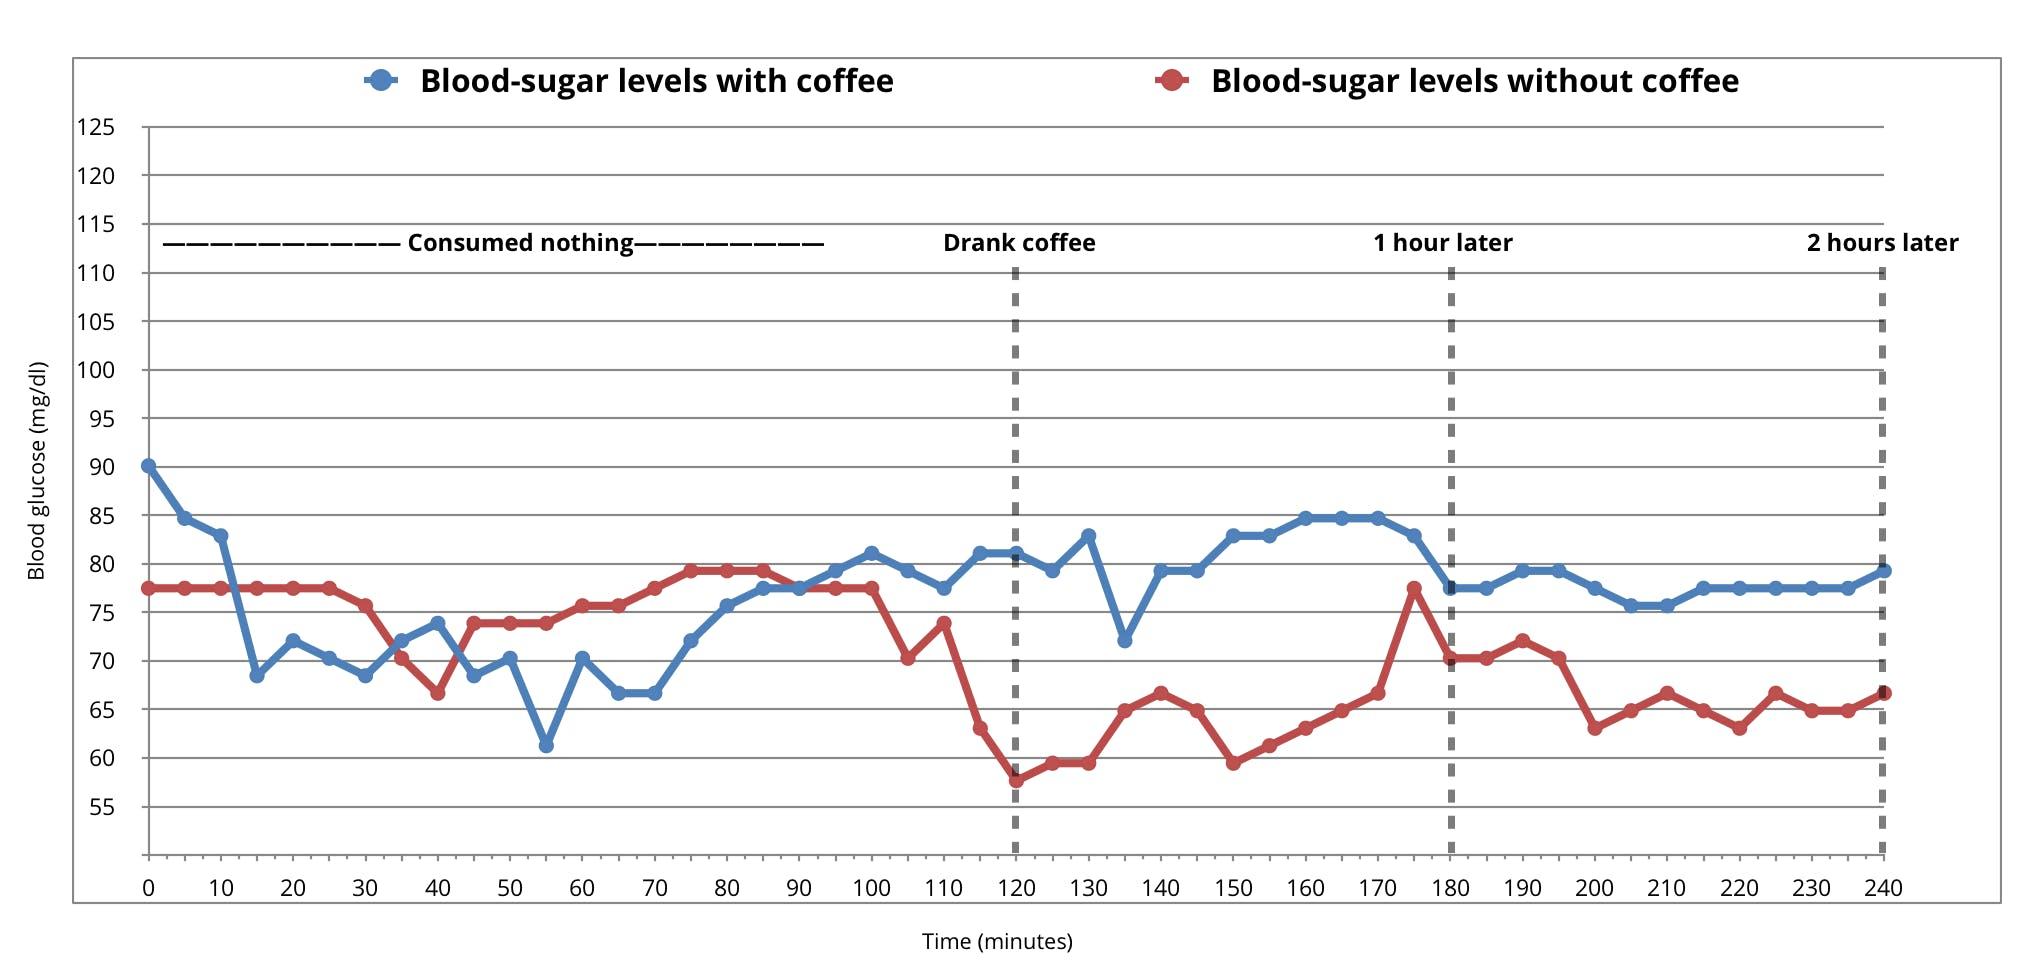 coffe-blood-sugar-premliminary